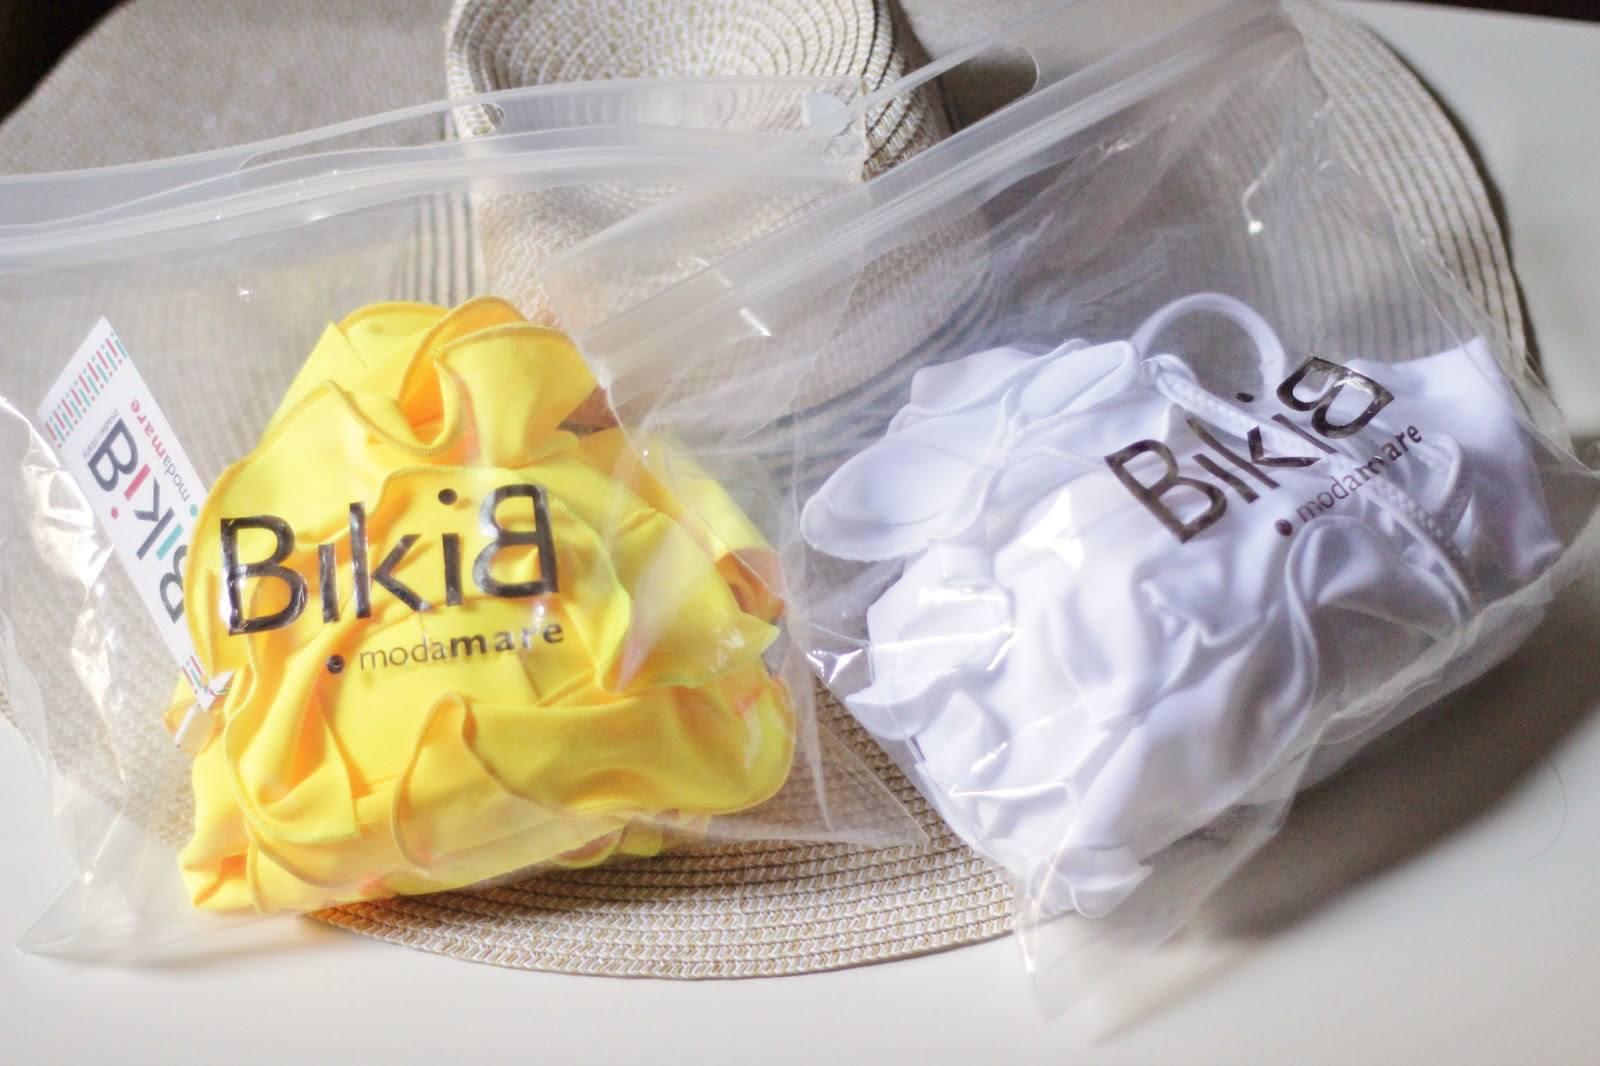 Insta-Bikib